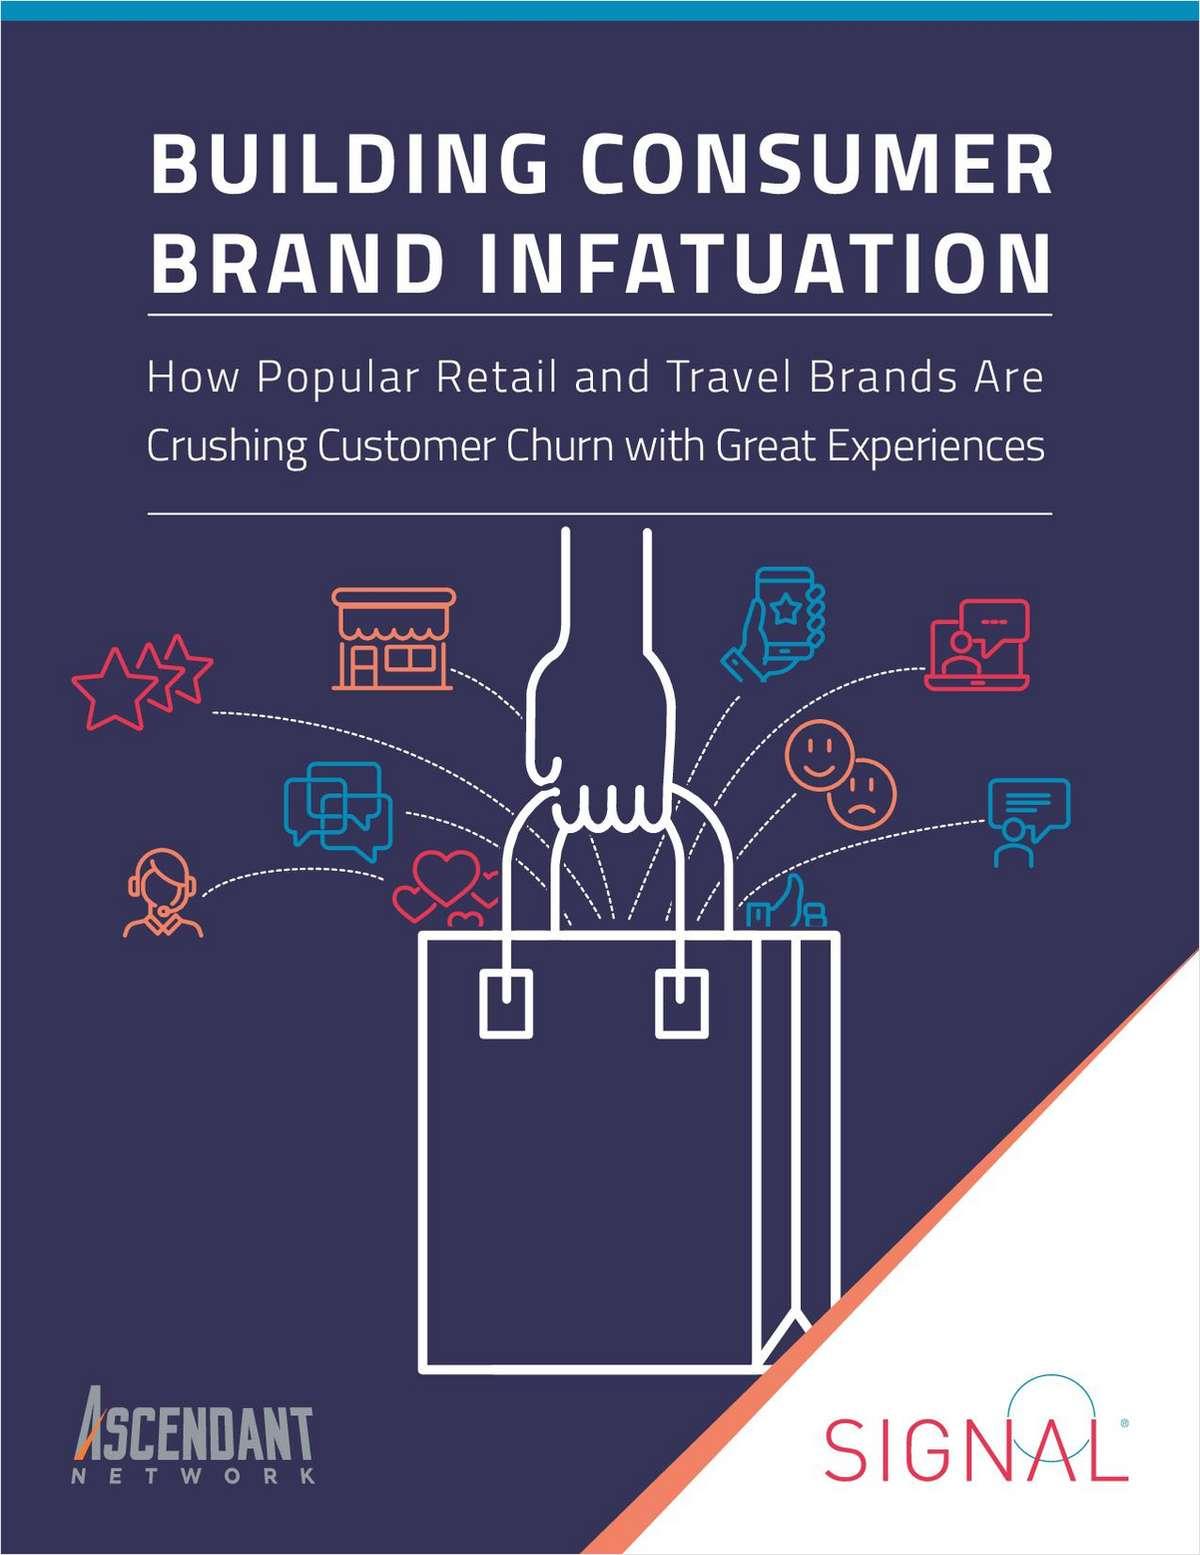 Building Consumer Brand Infatuation